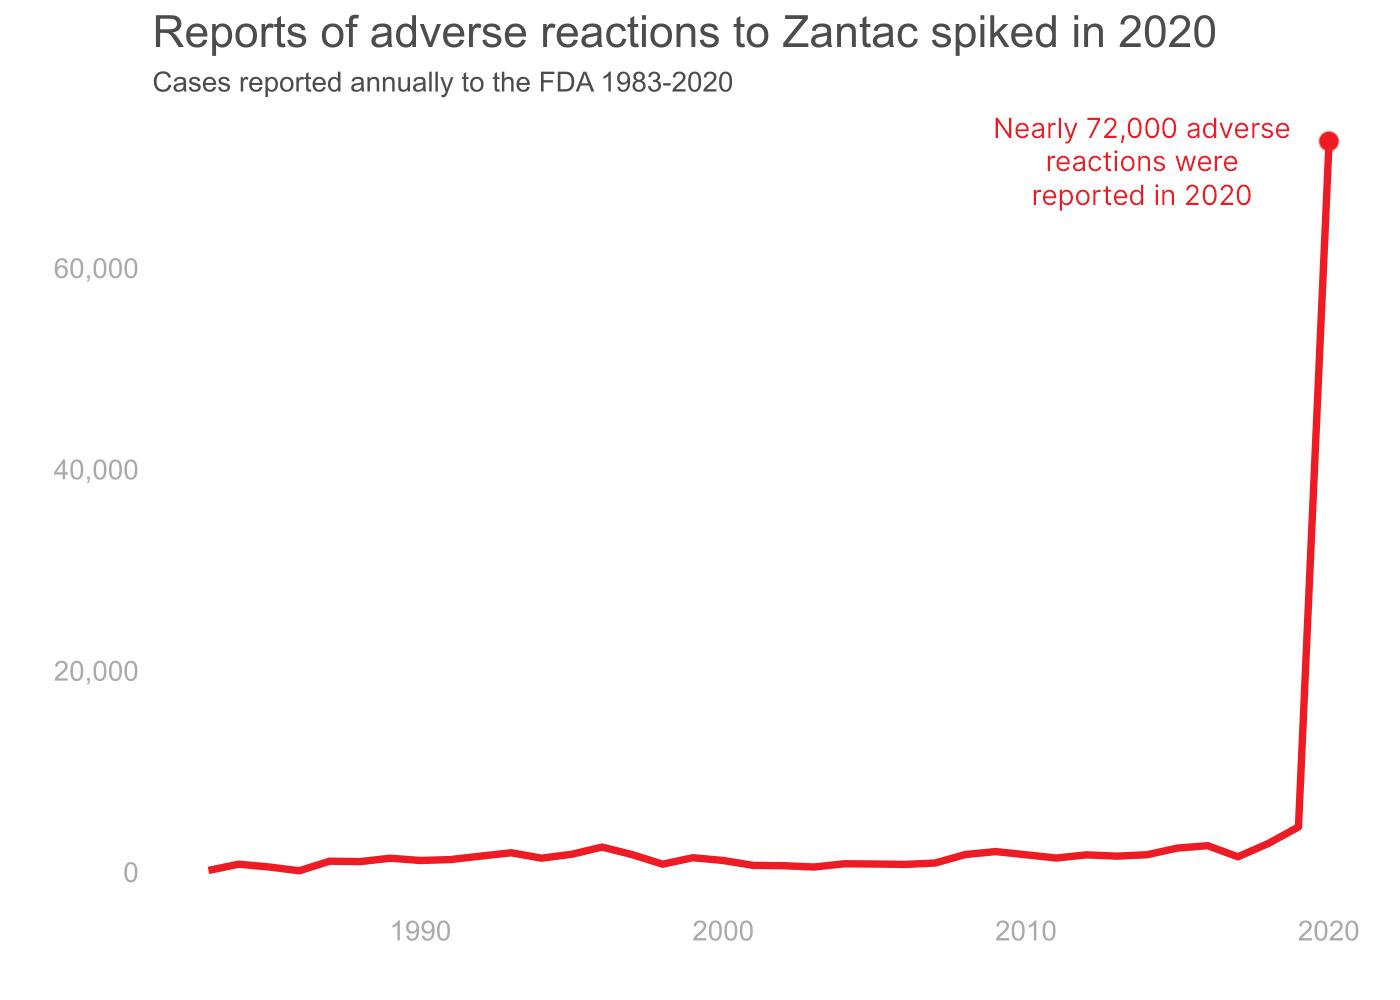 Zantac Reaction Cases